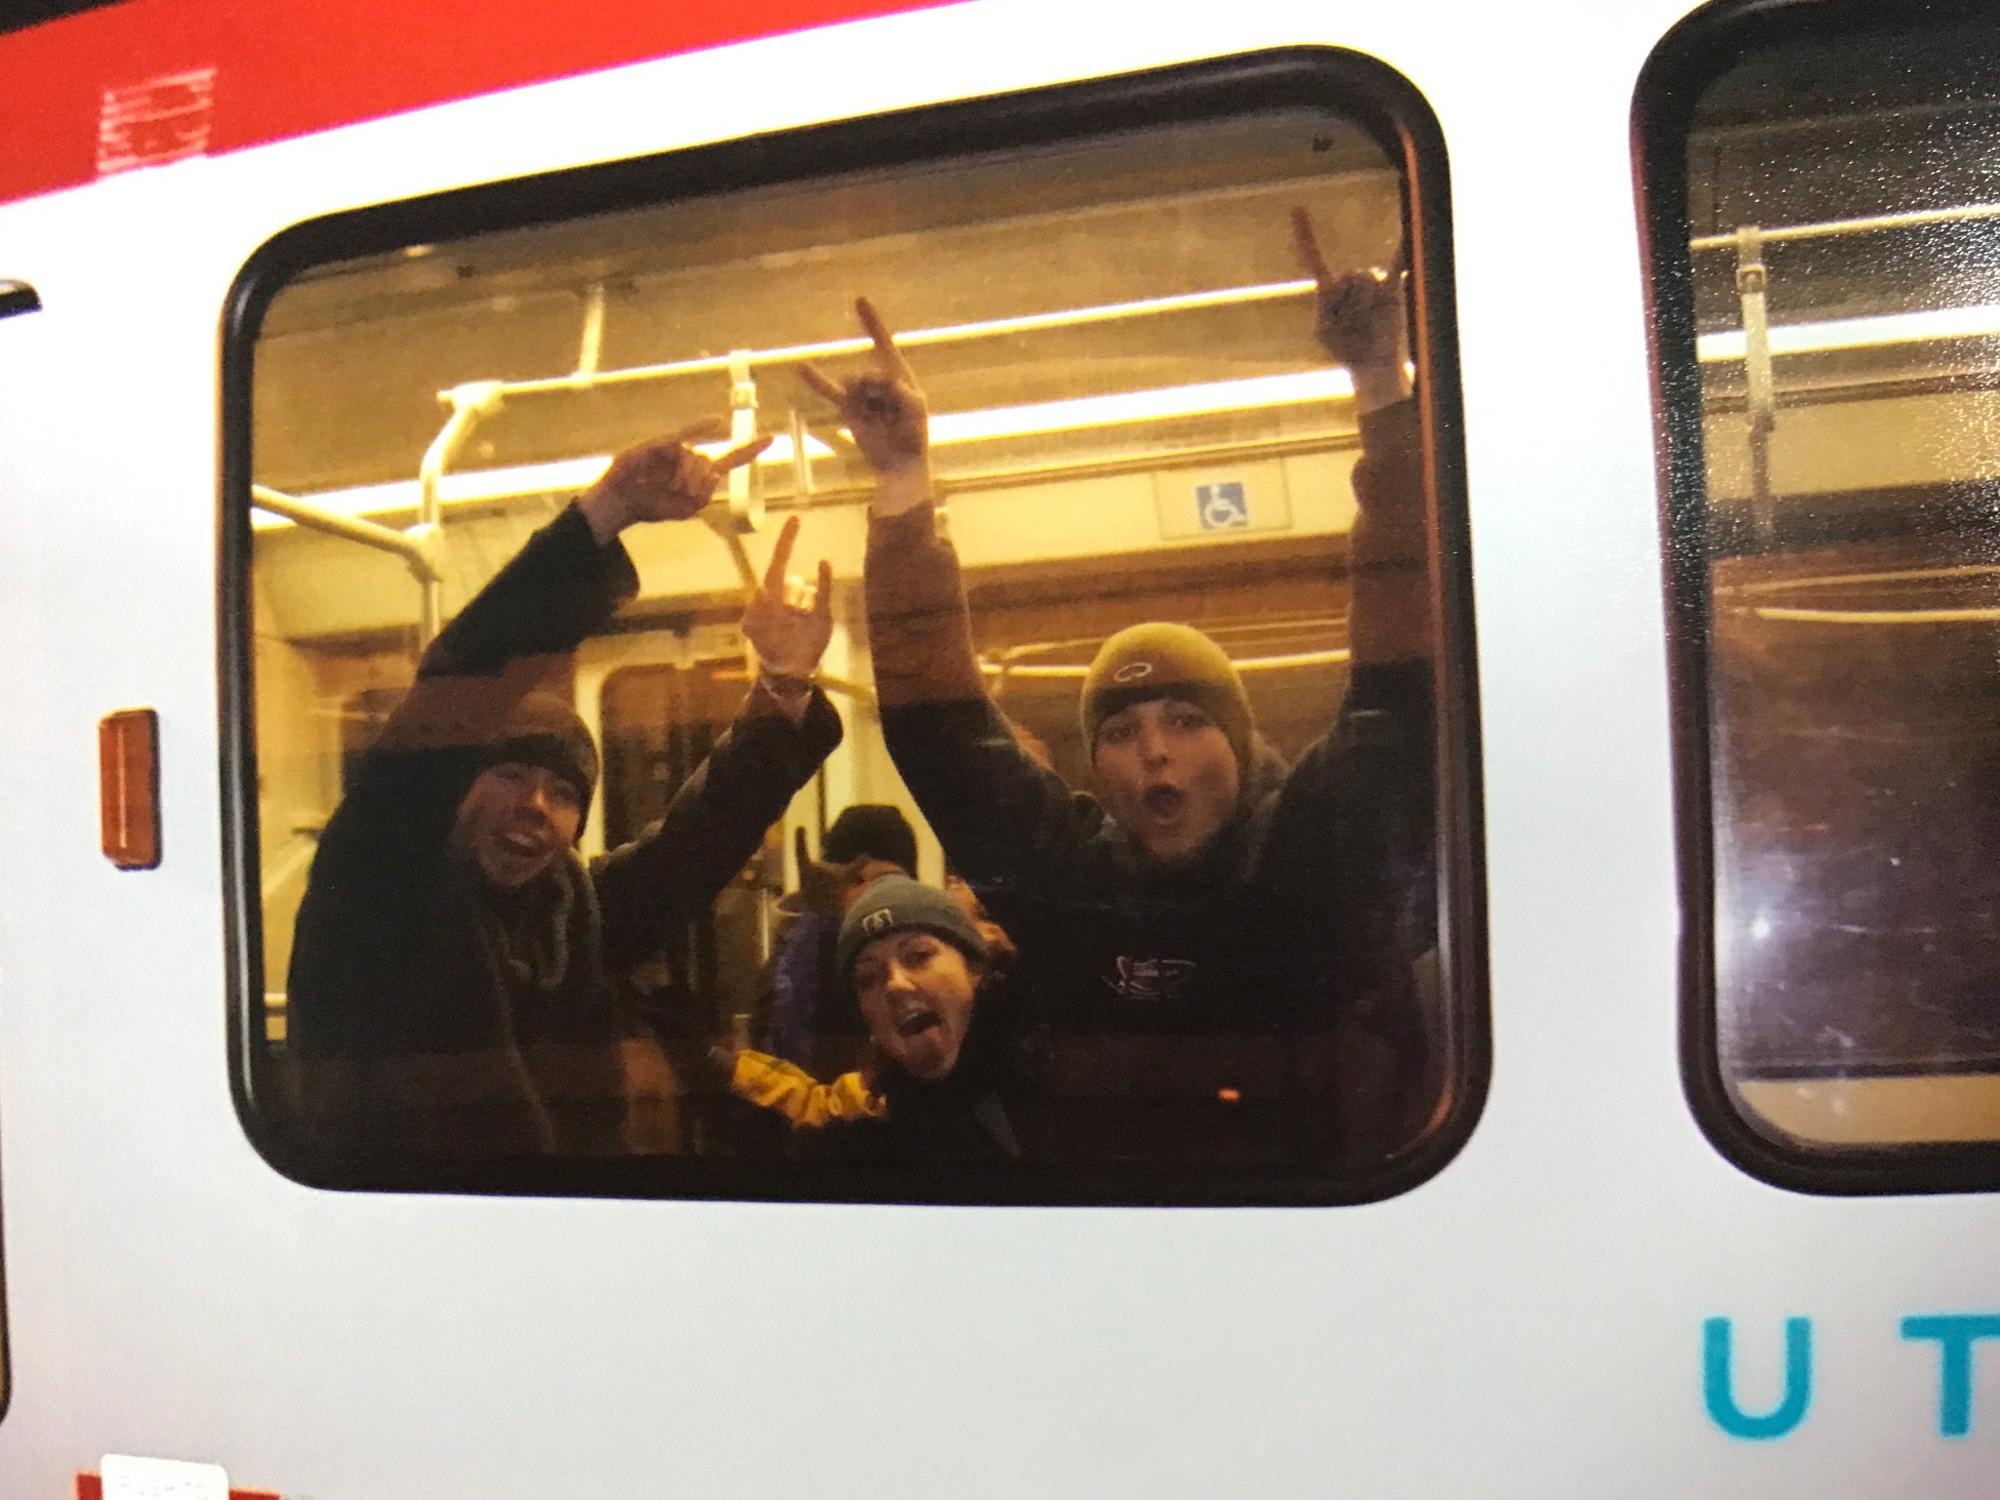 uta remembers the 2002 winter olympics